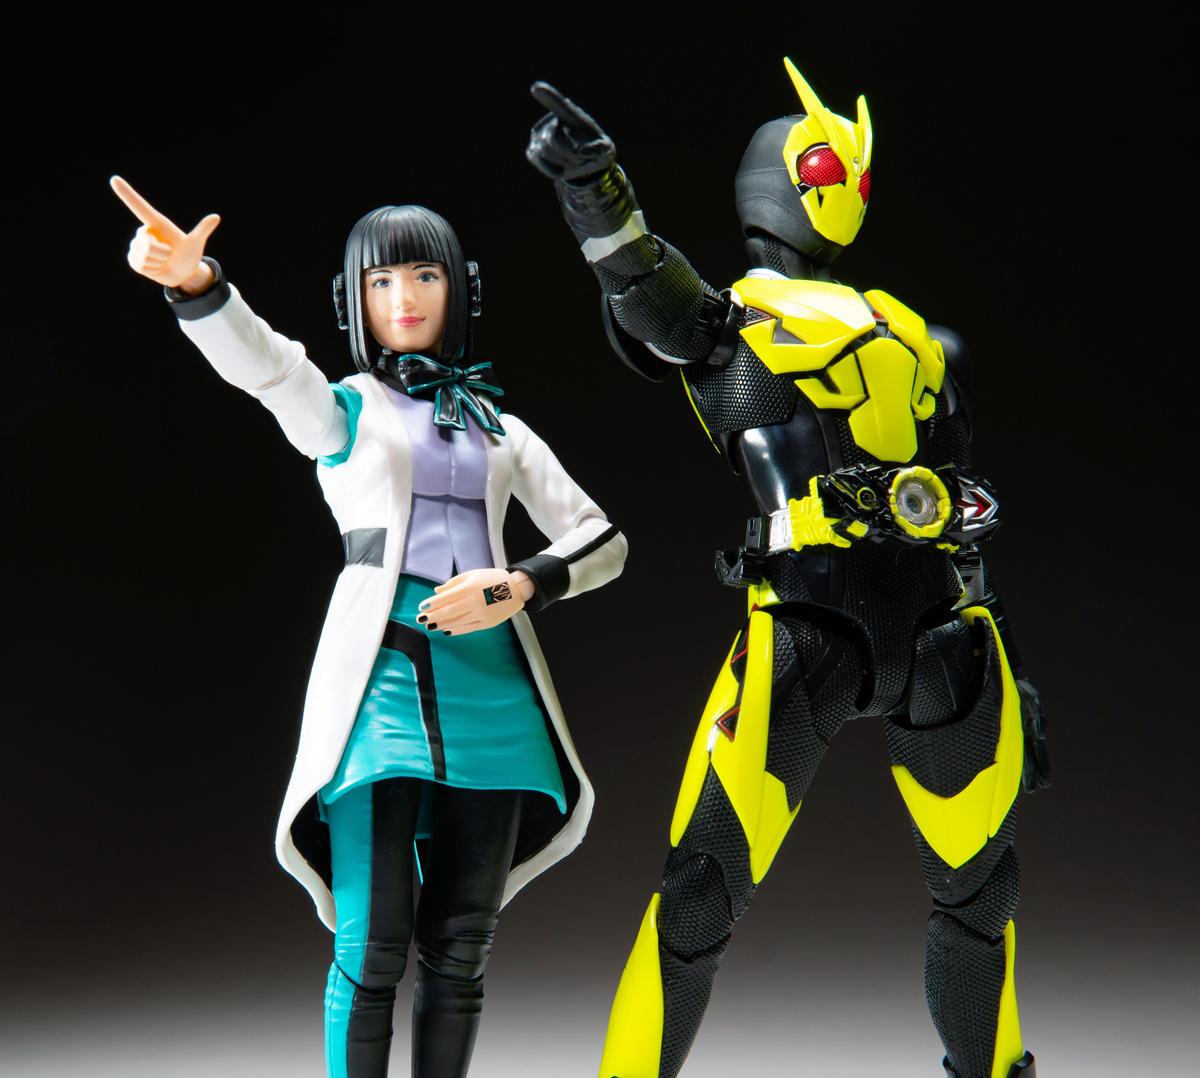 f:id:hiroban-ch:20210206205453j:plain